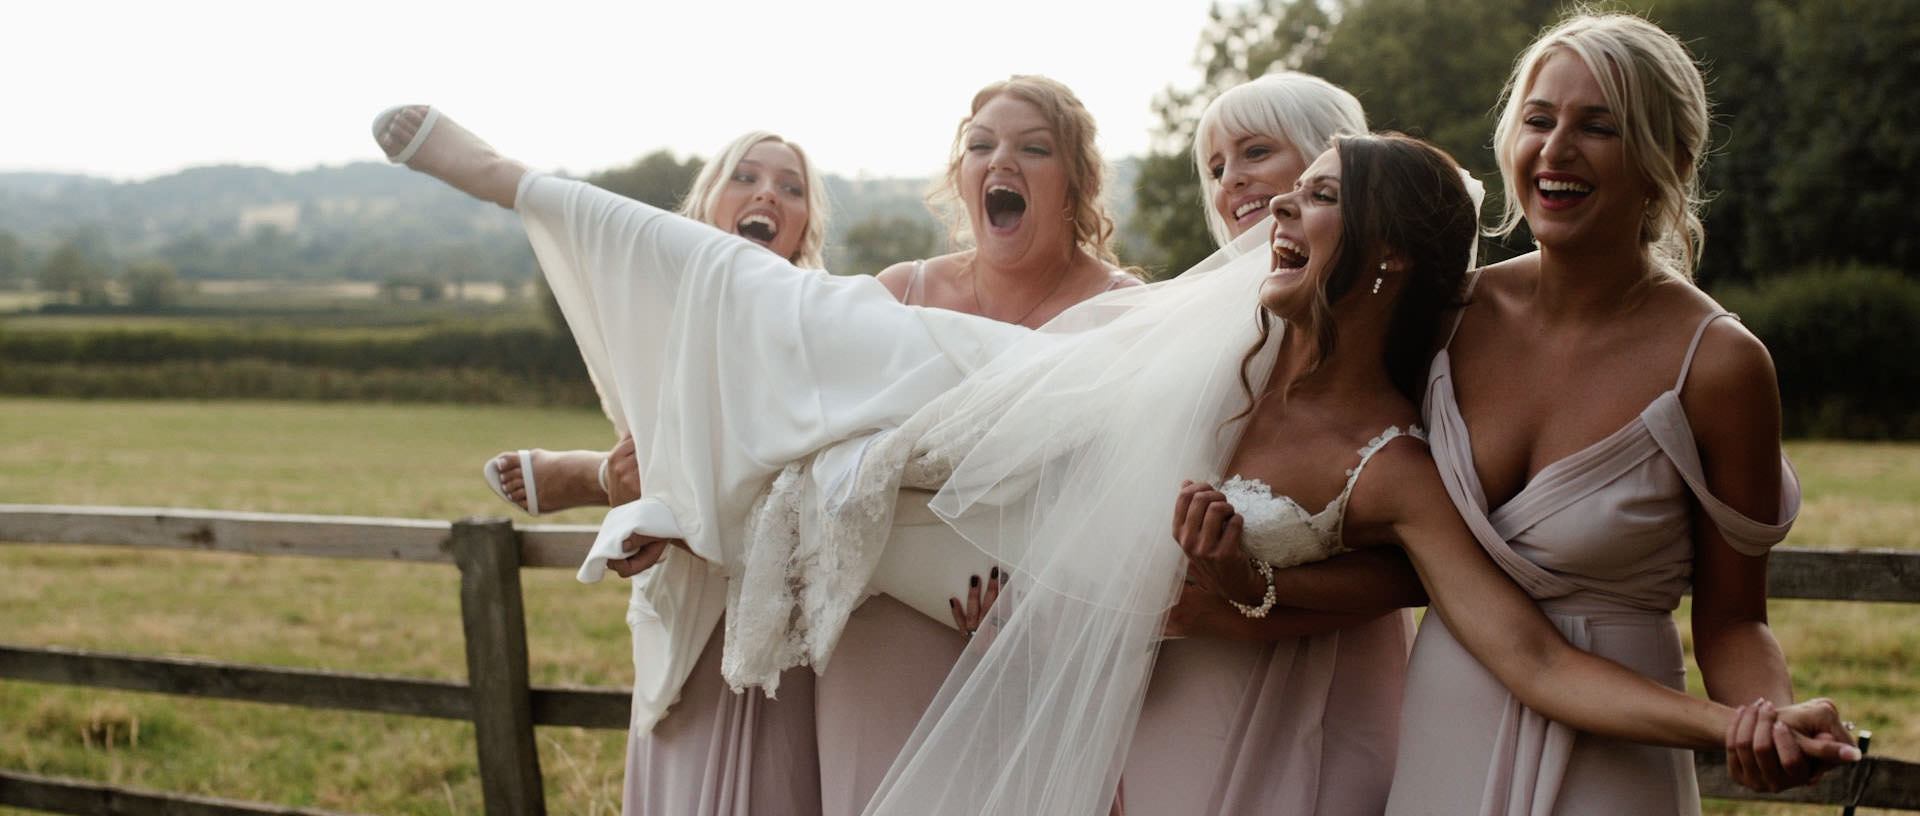 Hyde Barn Colswolds Wedding Verity-Jade & Kai 30 Cropped.jpg